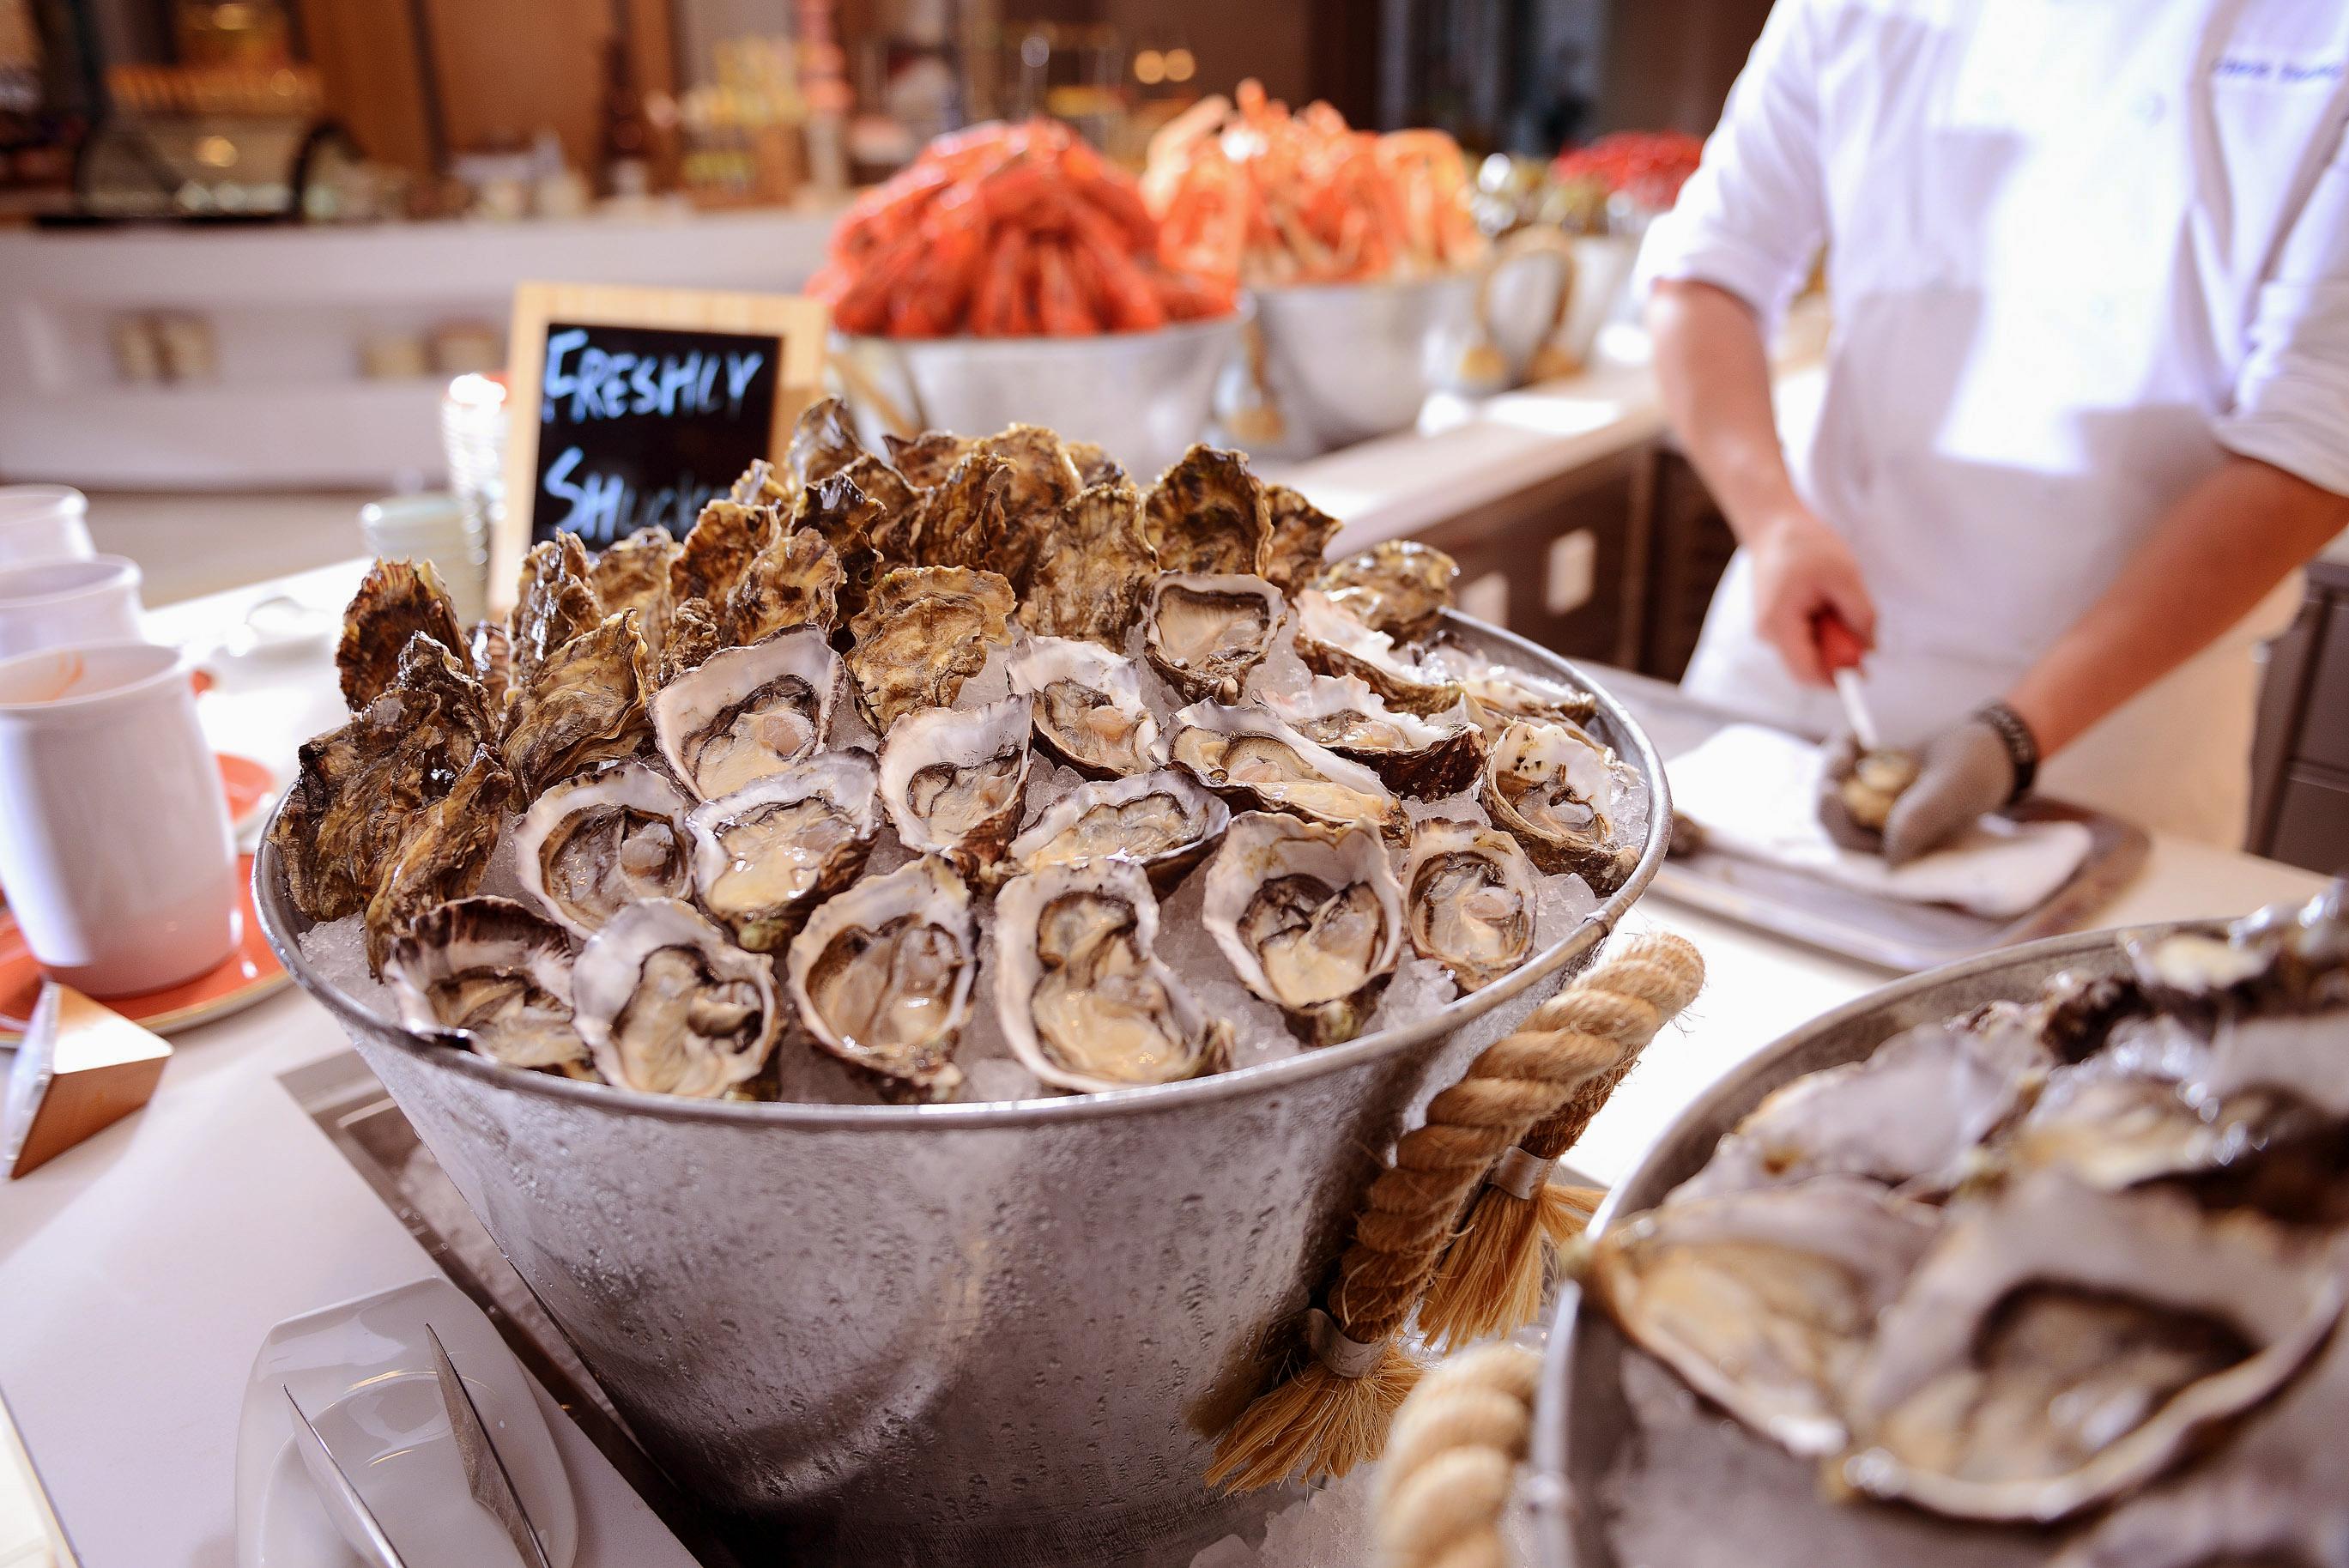 the-place-freshly-shucked-oysters-1_-%e6%96%b0%e9%ae%ae%e4%be%9b%e6%87%89%e7%9a%84%e6%99%82%e4%bb%a4%e5%8d%b3%e9%96%8b%e7%94%9f%e8%a0%941